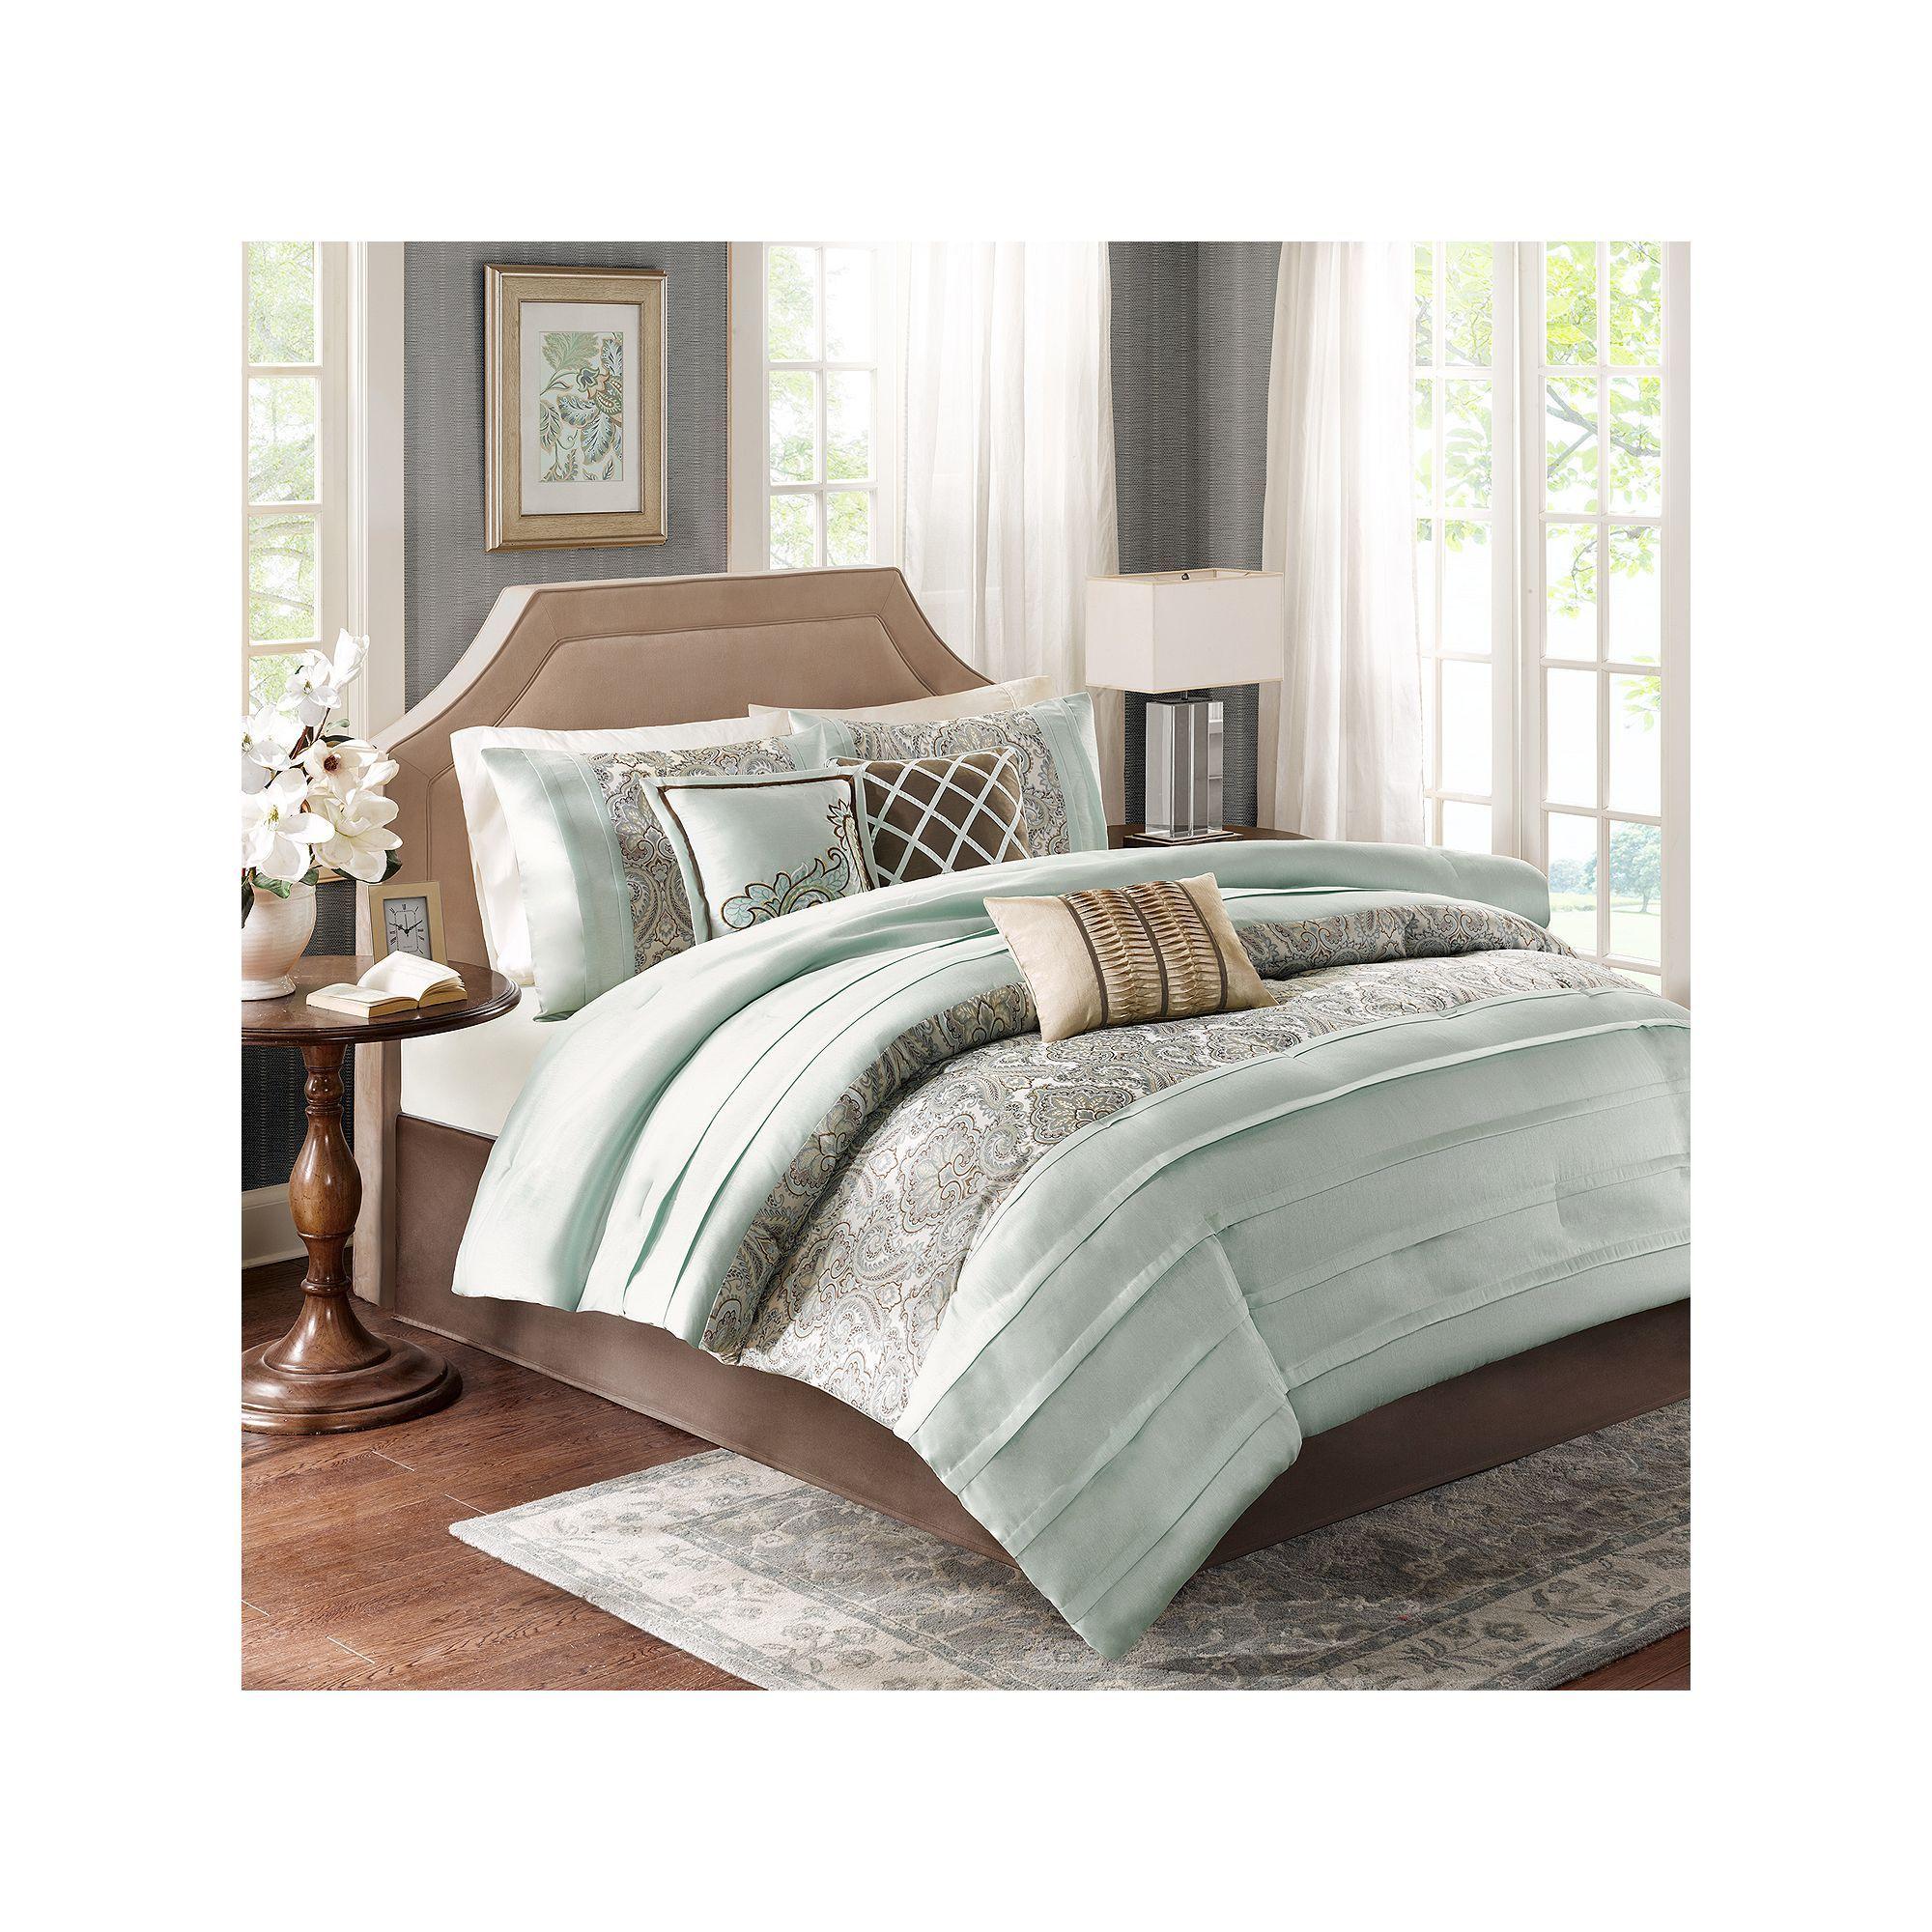 collection dwp product zoom comforter woodlands a desktop comp p bedding src tide belk layer southern